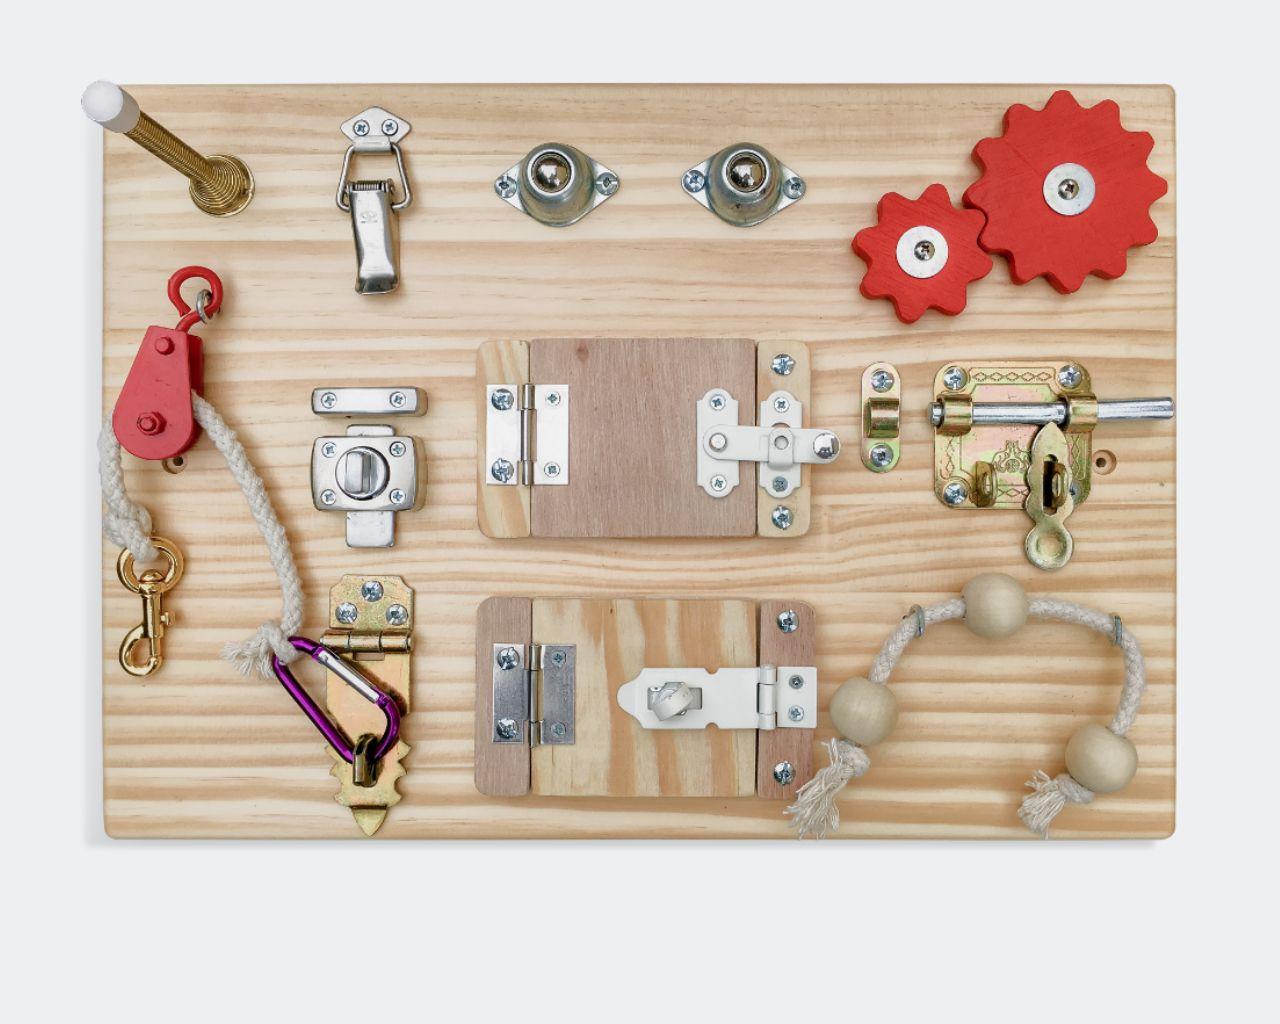 make your custom design in Easy Busy Board Builder